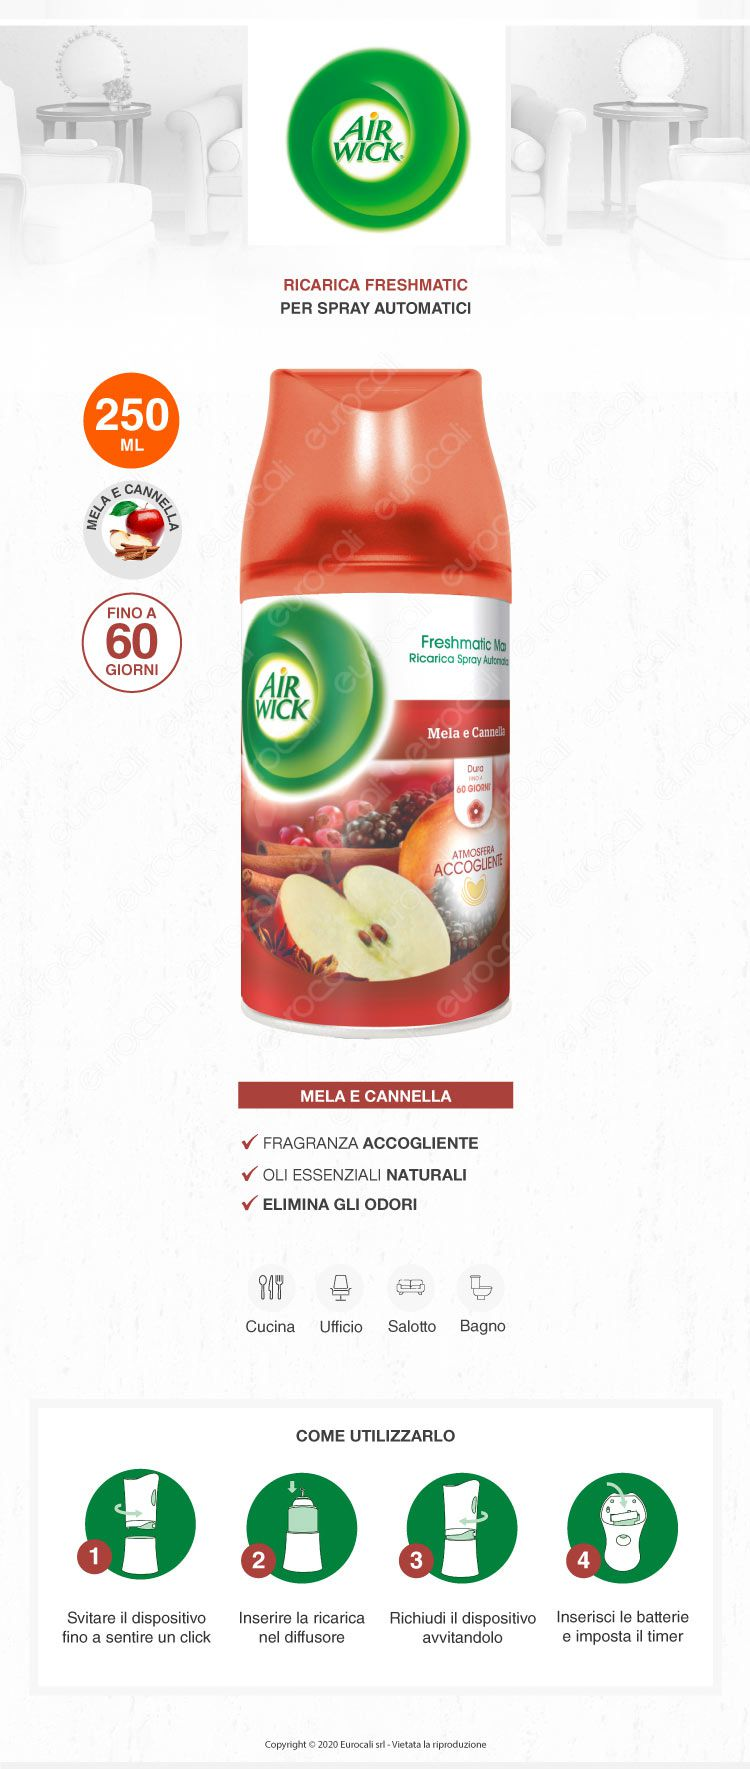 Air Wick Freshmatic Ricarica Spray Profumo Mela Cannella